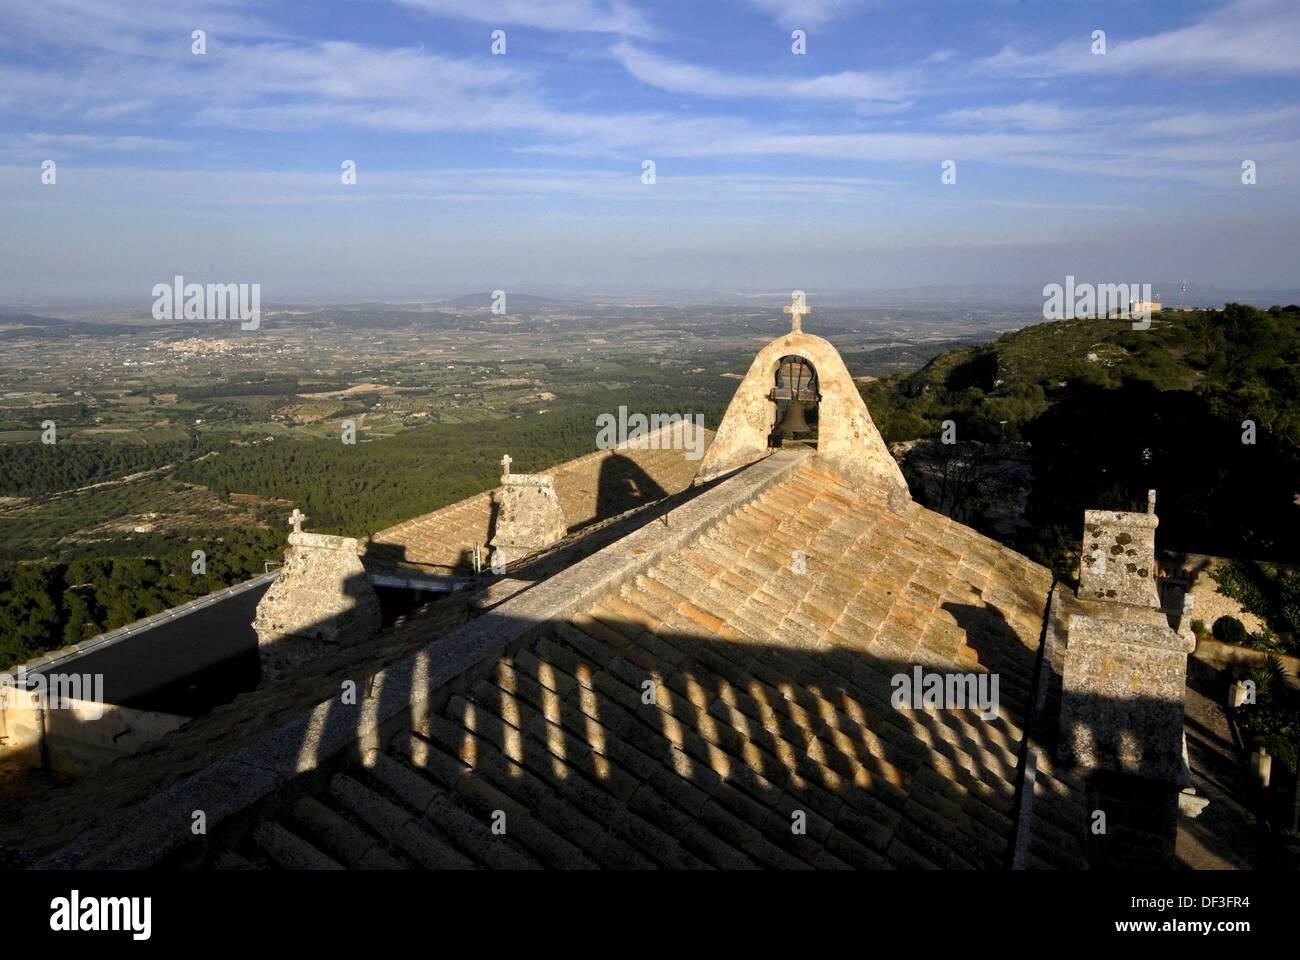 Monasterio de Cura. Cura Puig fifteenth century. Randa. District of Es Pla. Mallorca Balearic Islands. Spain - Stock Image